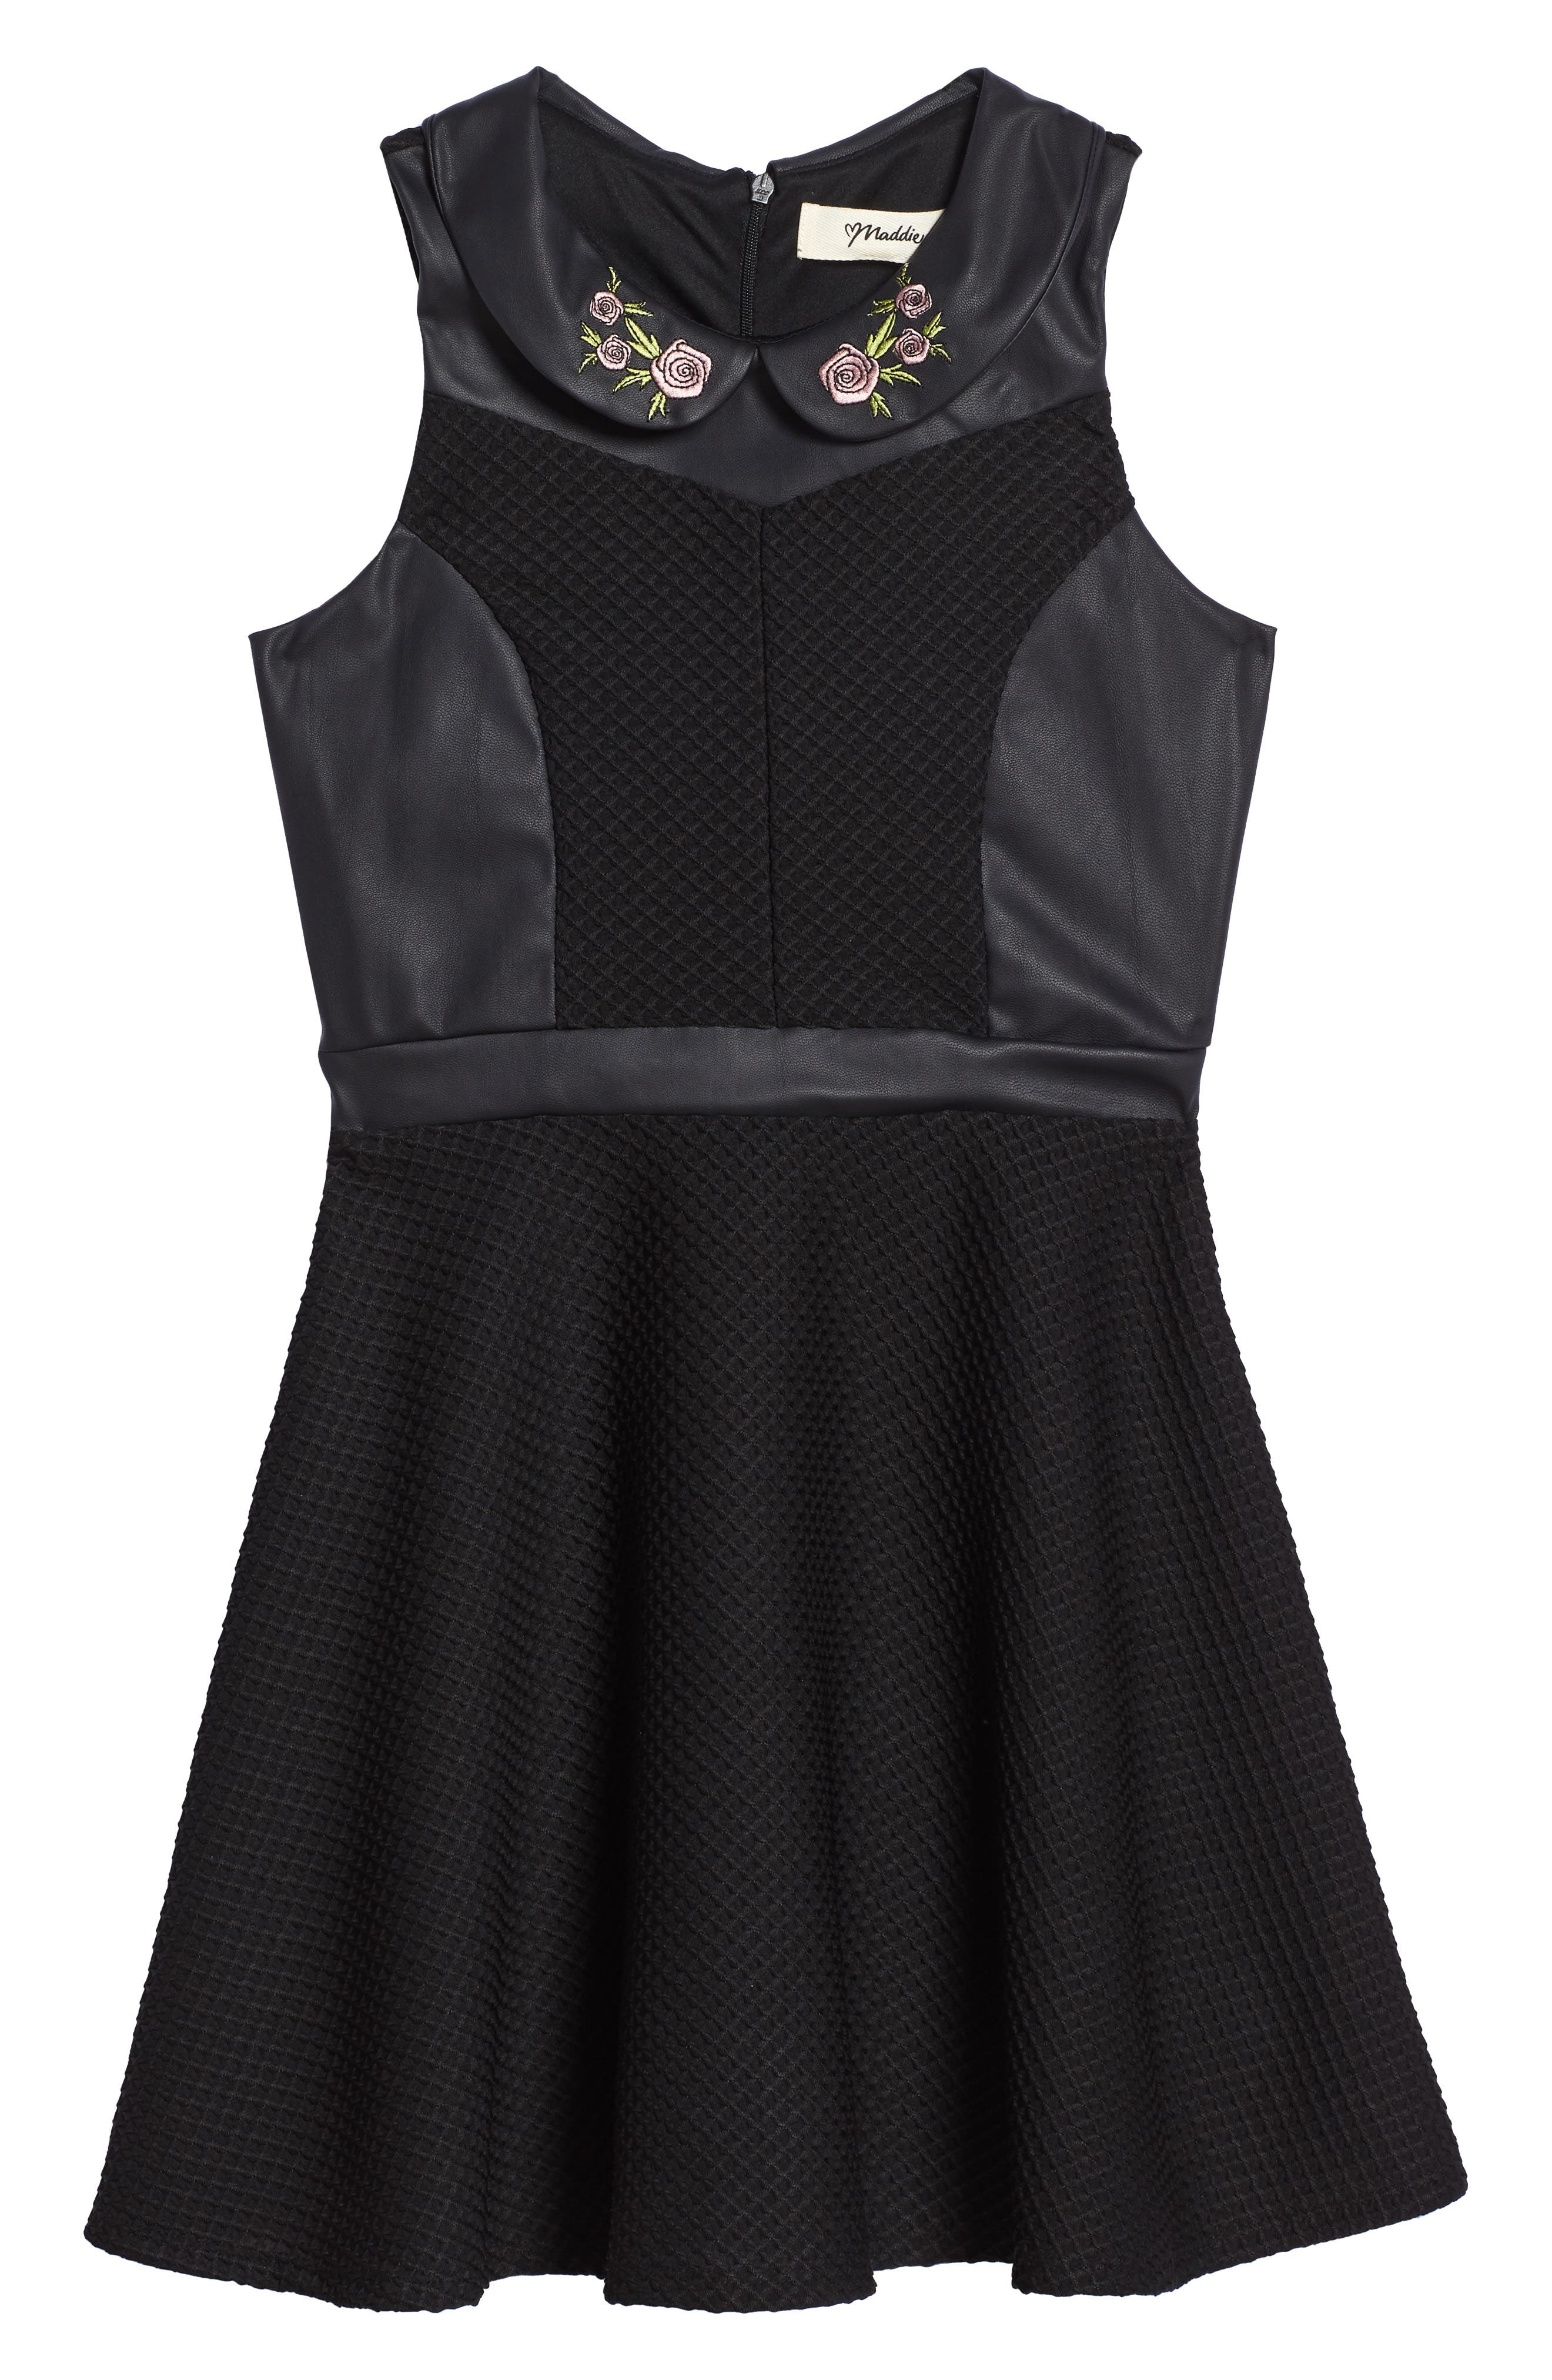 Main Image - Maddie Faux Leather Skater Dress (Big Girls)